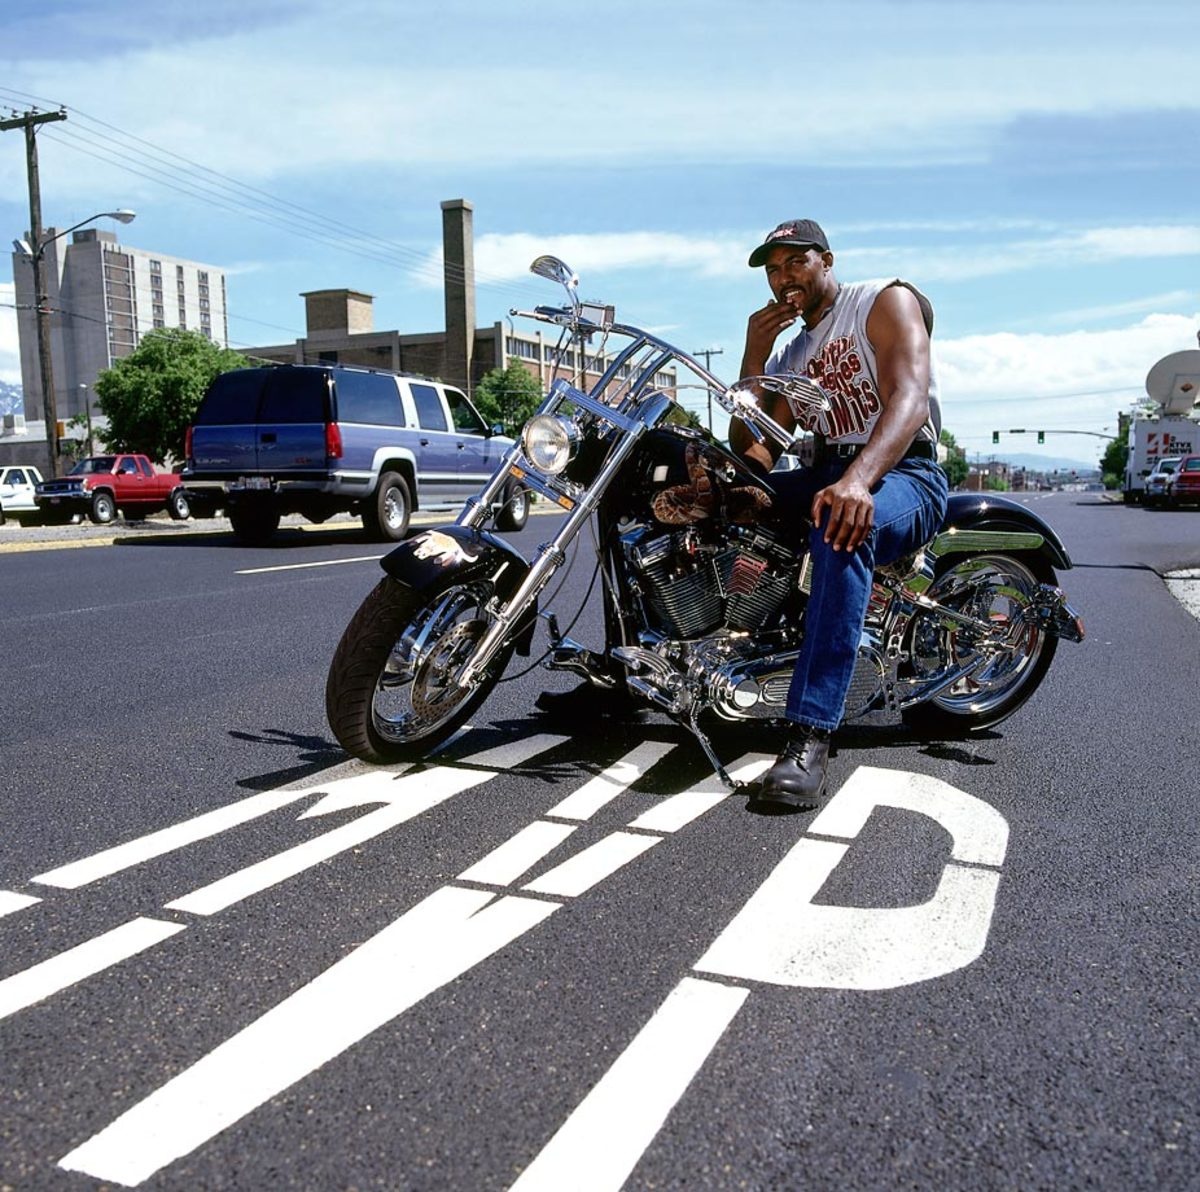 1997-Karl-Malone-motorcycle.jpg